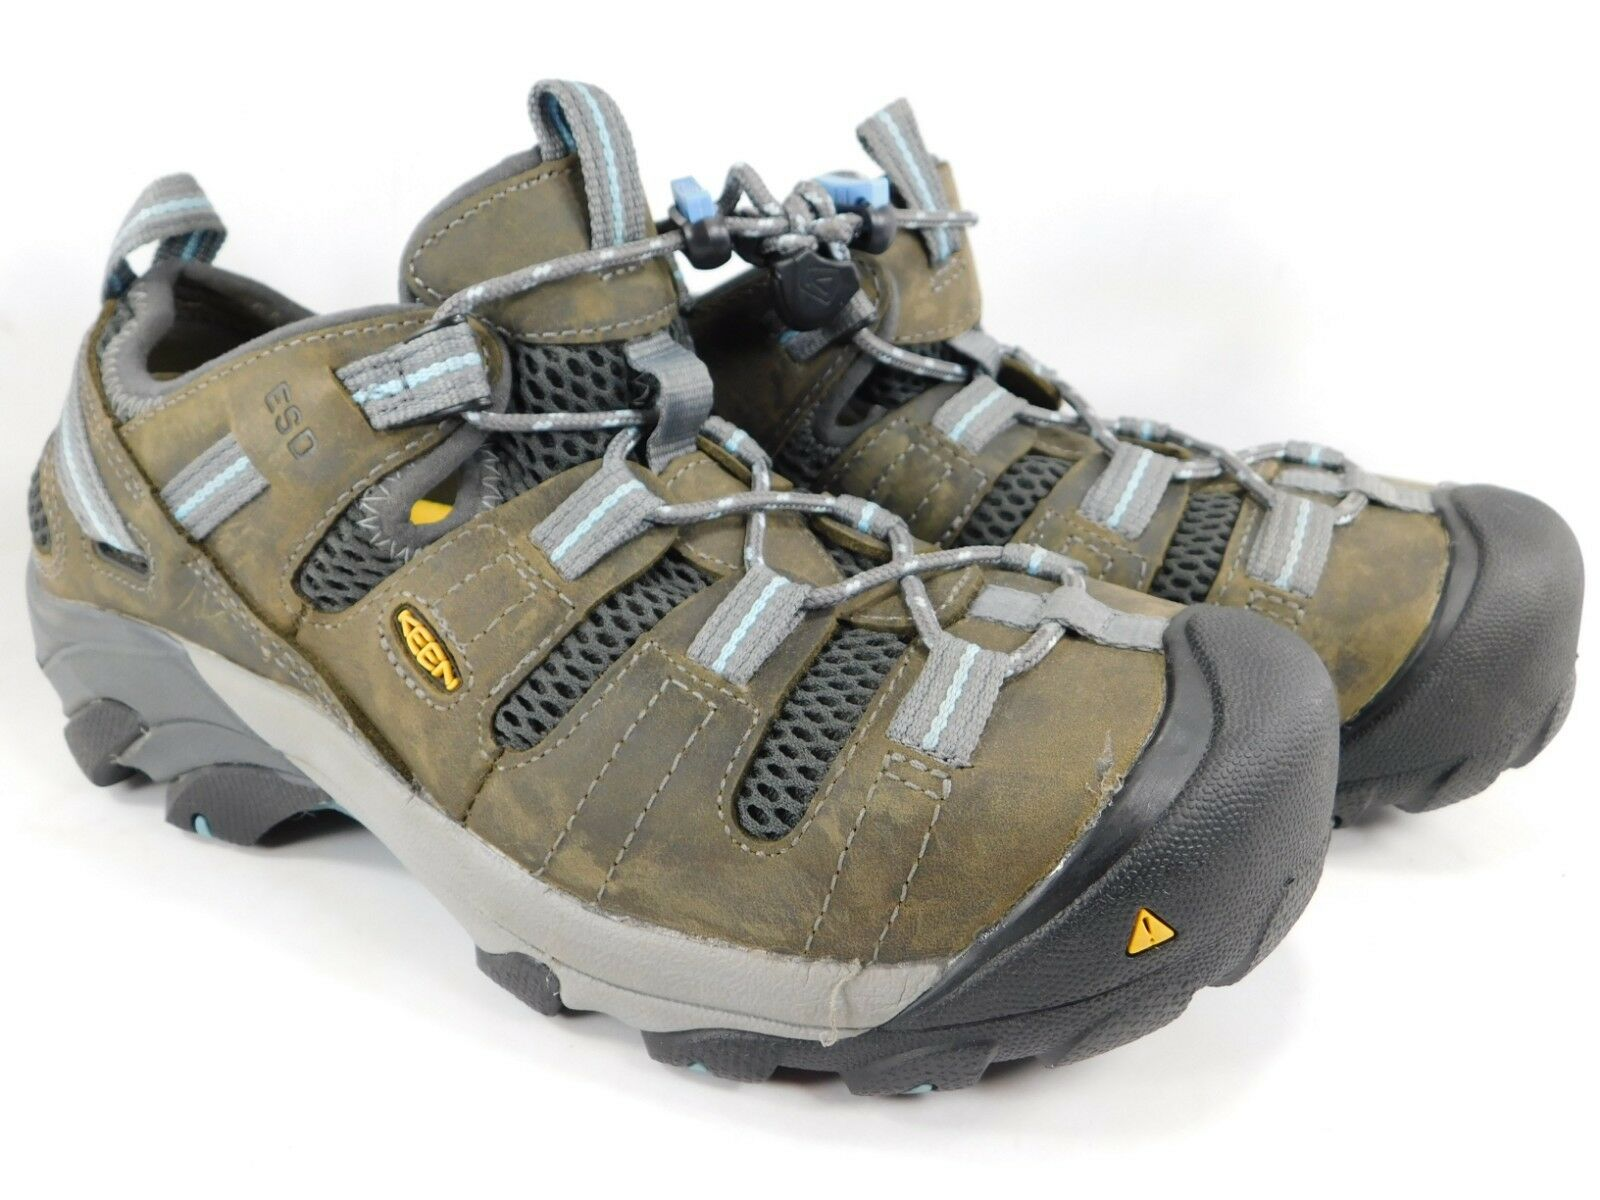 Keen Atlanta Cool ESD Size 8.5 M (B) EU 39 Women's Steel Toe Work shoes 1007017